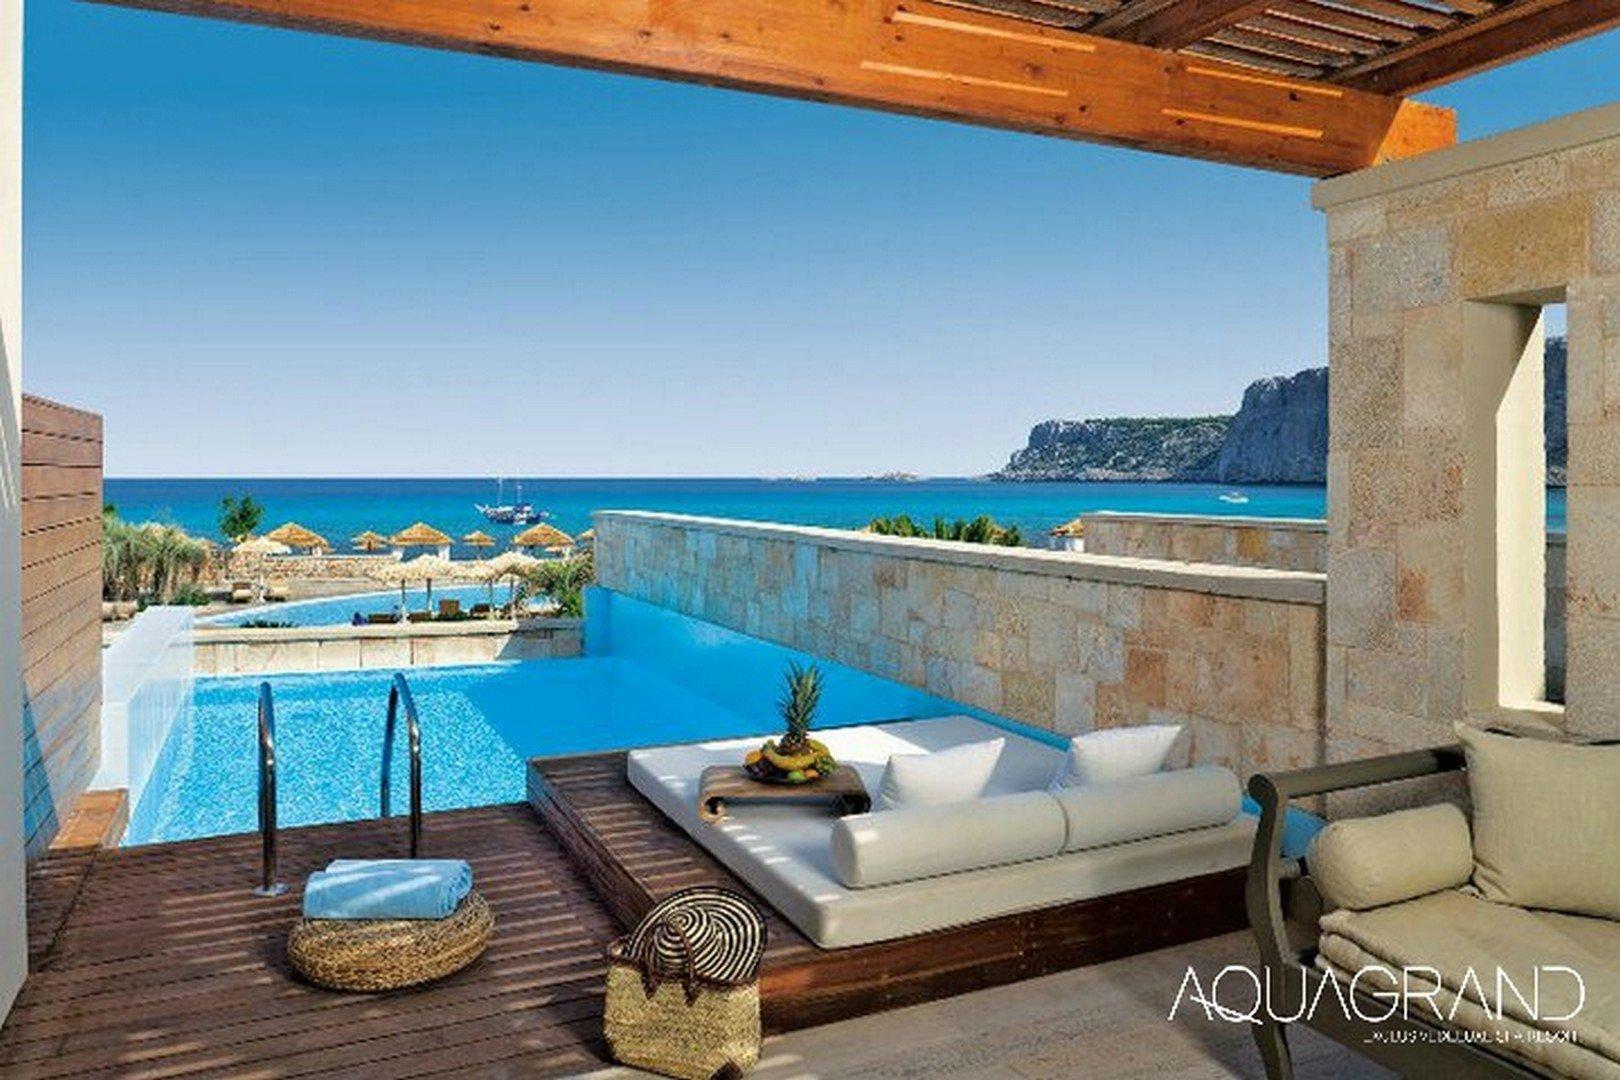 Hotel Aquagrand Exclusive Deluxe Resort - Lindos - Kamer Princess Pool Suite